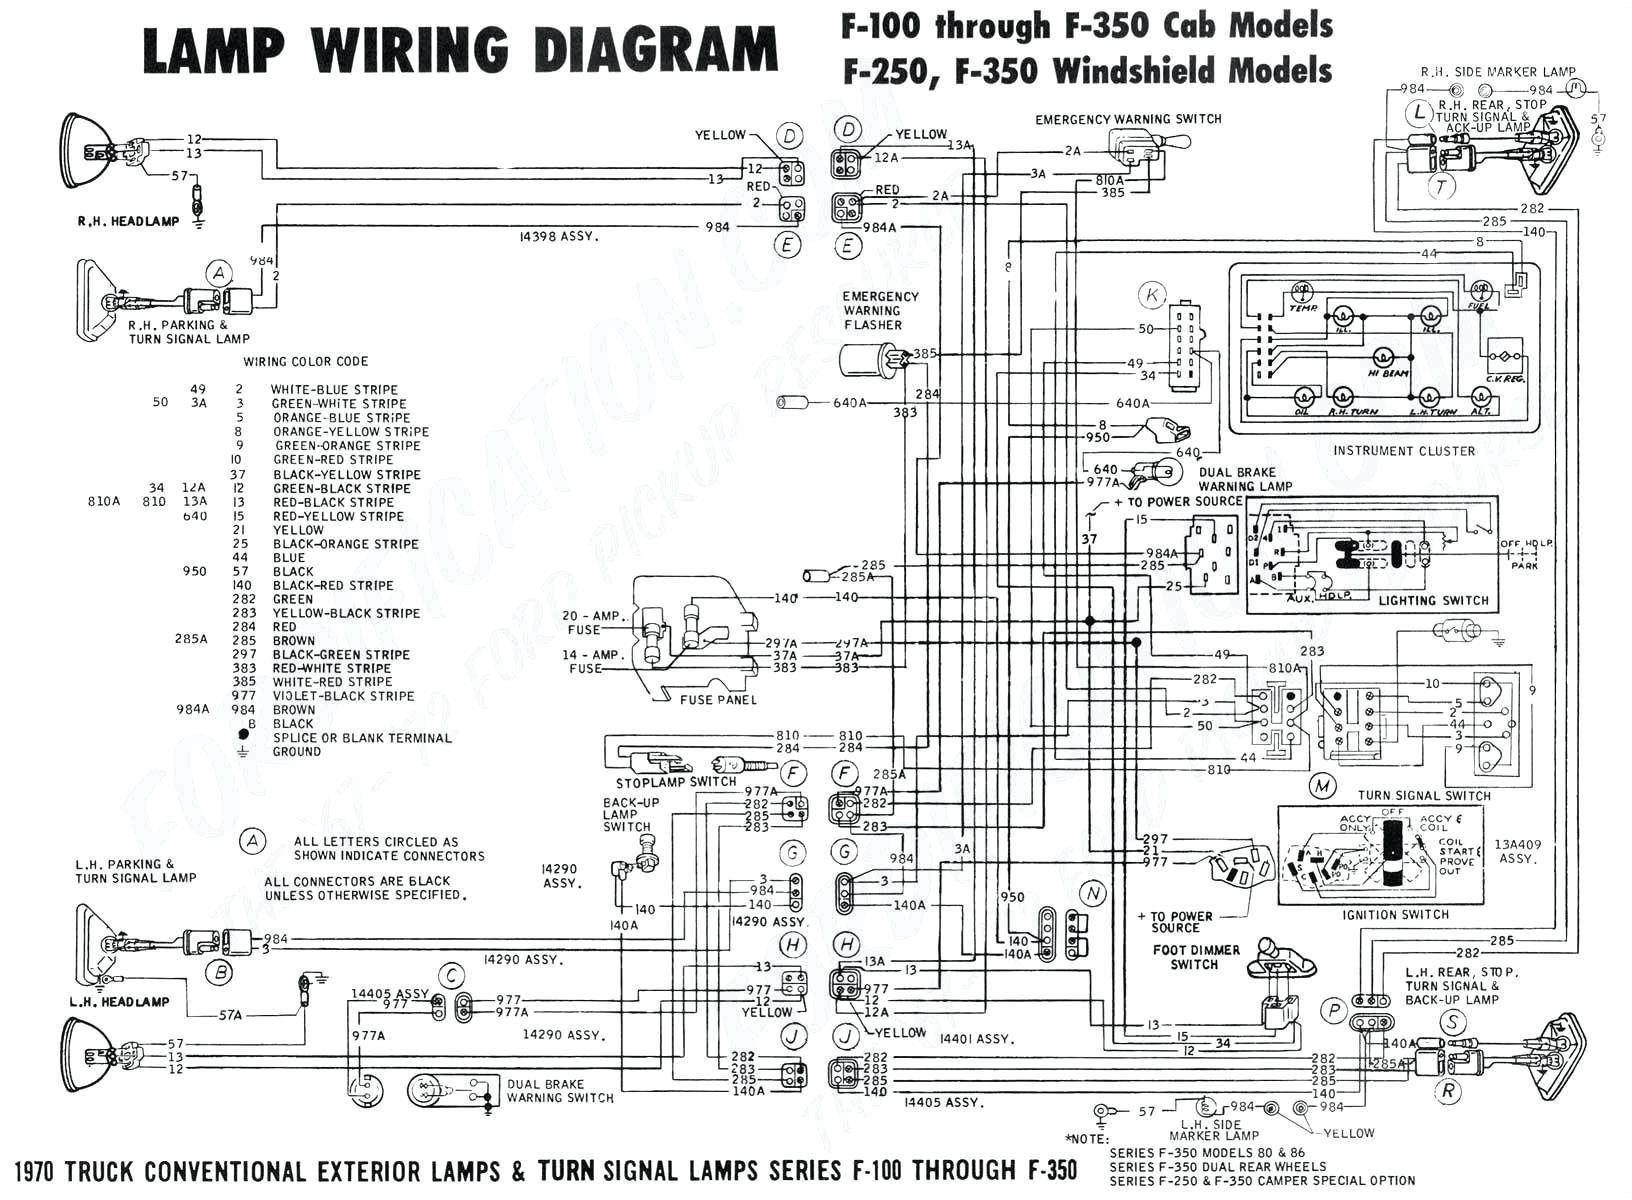 2006 volvo fuse diagram wiring diagram paper 2006 volvo s60 wiring diagram 2000 volvo s80 fuse